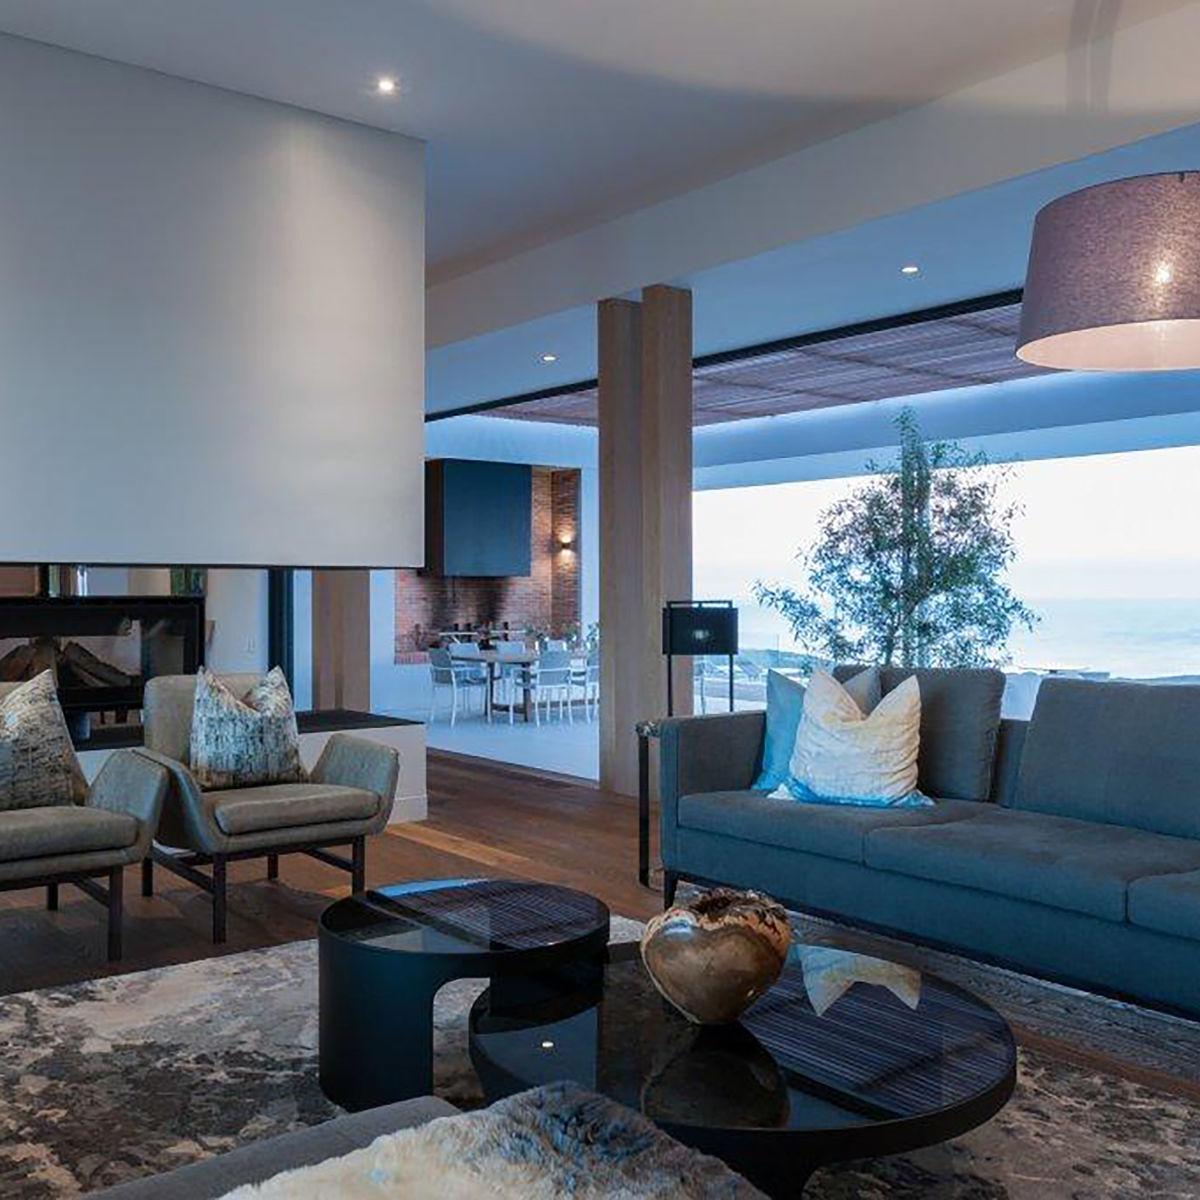 OKHA furniture shown here: Hunt Sofa, Nicci Armchairs, Burbuja Coffee table, and accessories